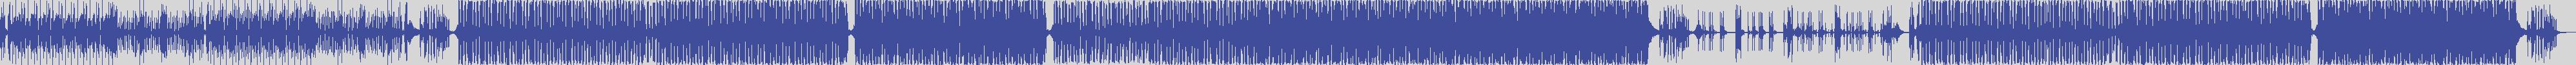 just_digital_records [JS1361] Kosmica - Hola [Original Mix] audio wave form